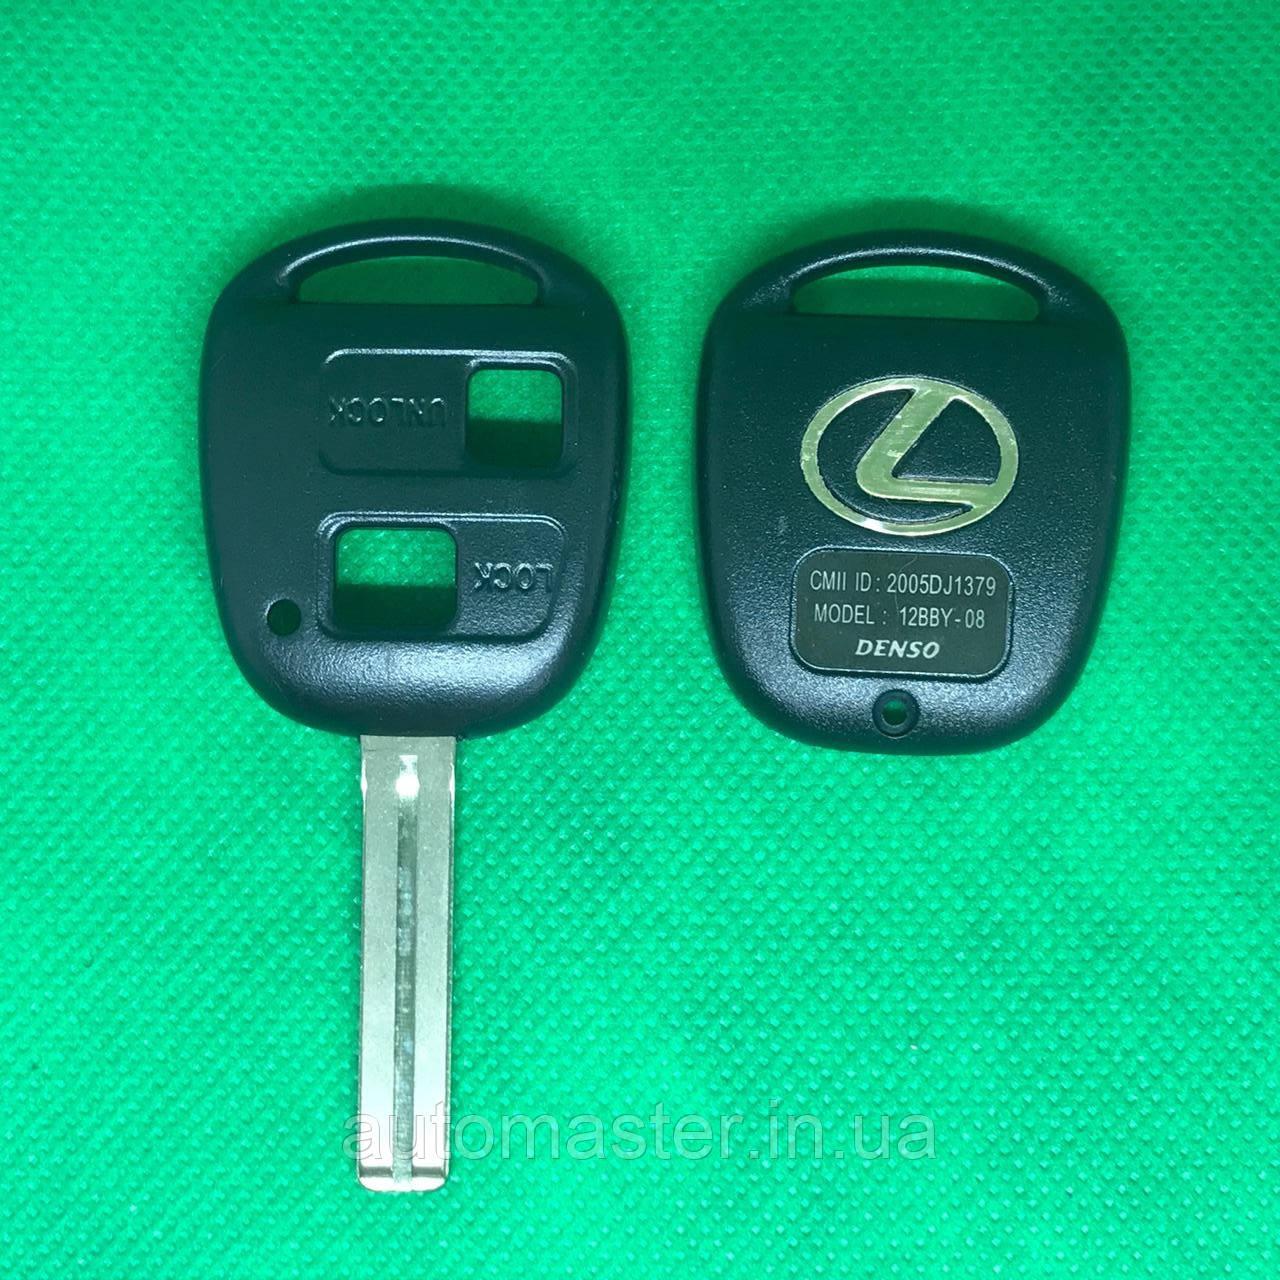 Корпус авто ключа LEXUS (Лексус) IS, GS, LX - 2 кнопки,  лезвие TOY48